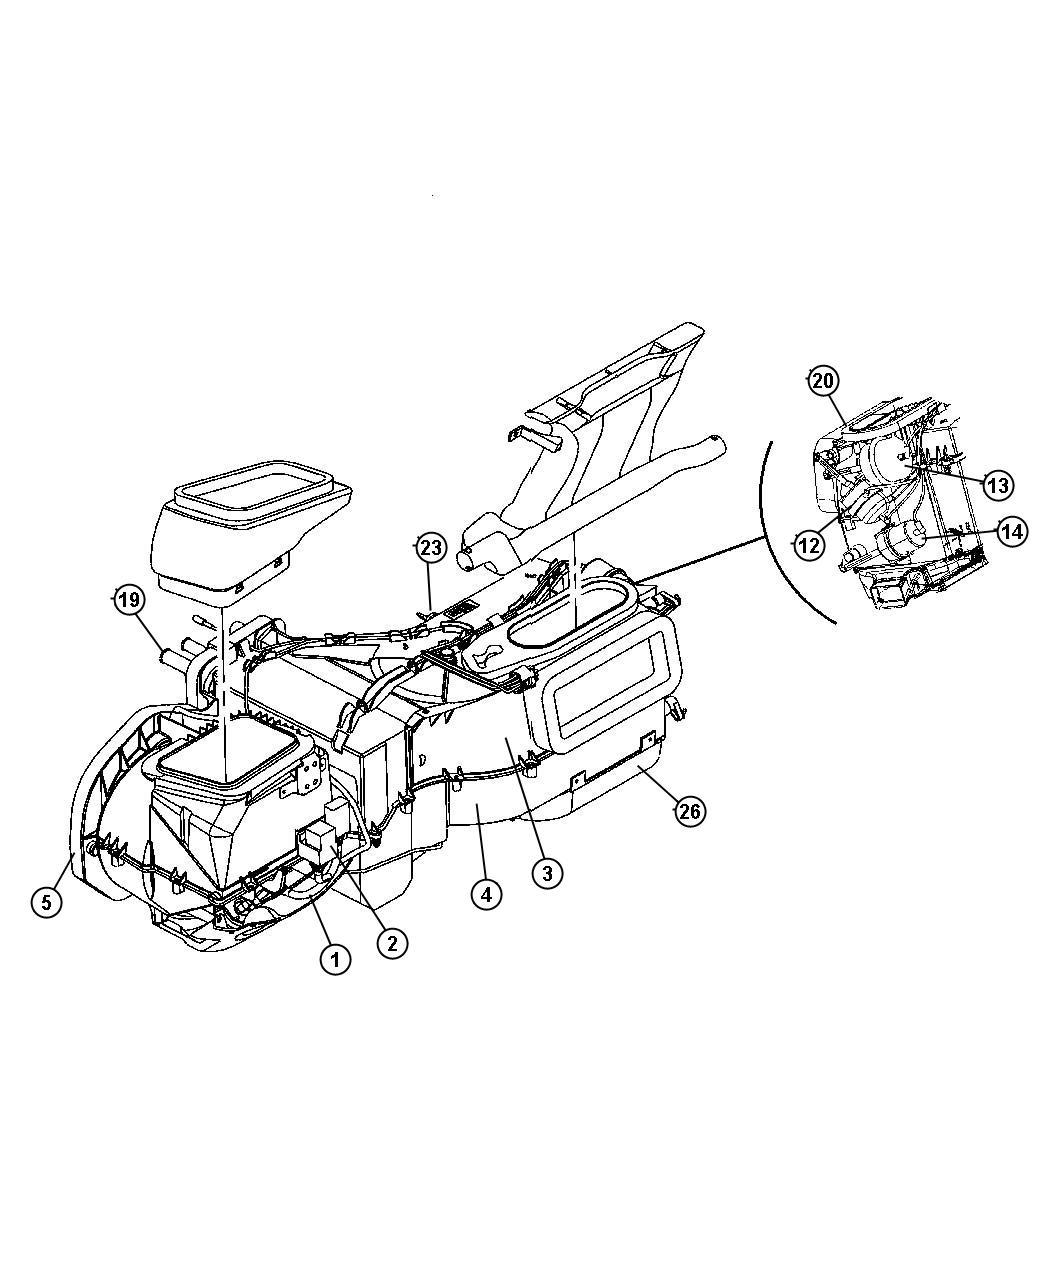 Jeep Wrangler Drain Tube Evaporator Housing Used For A